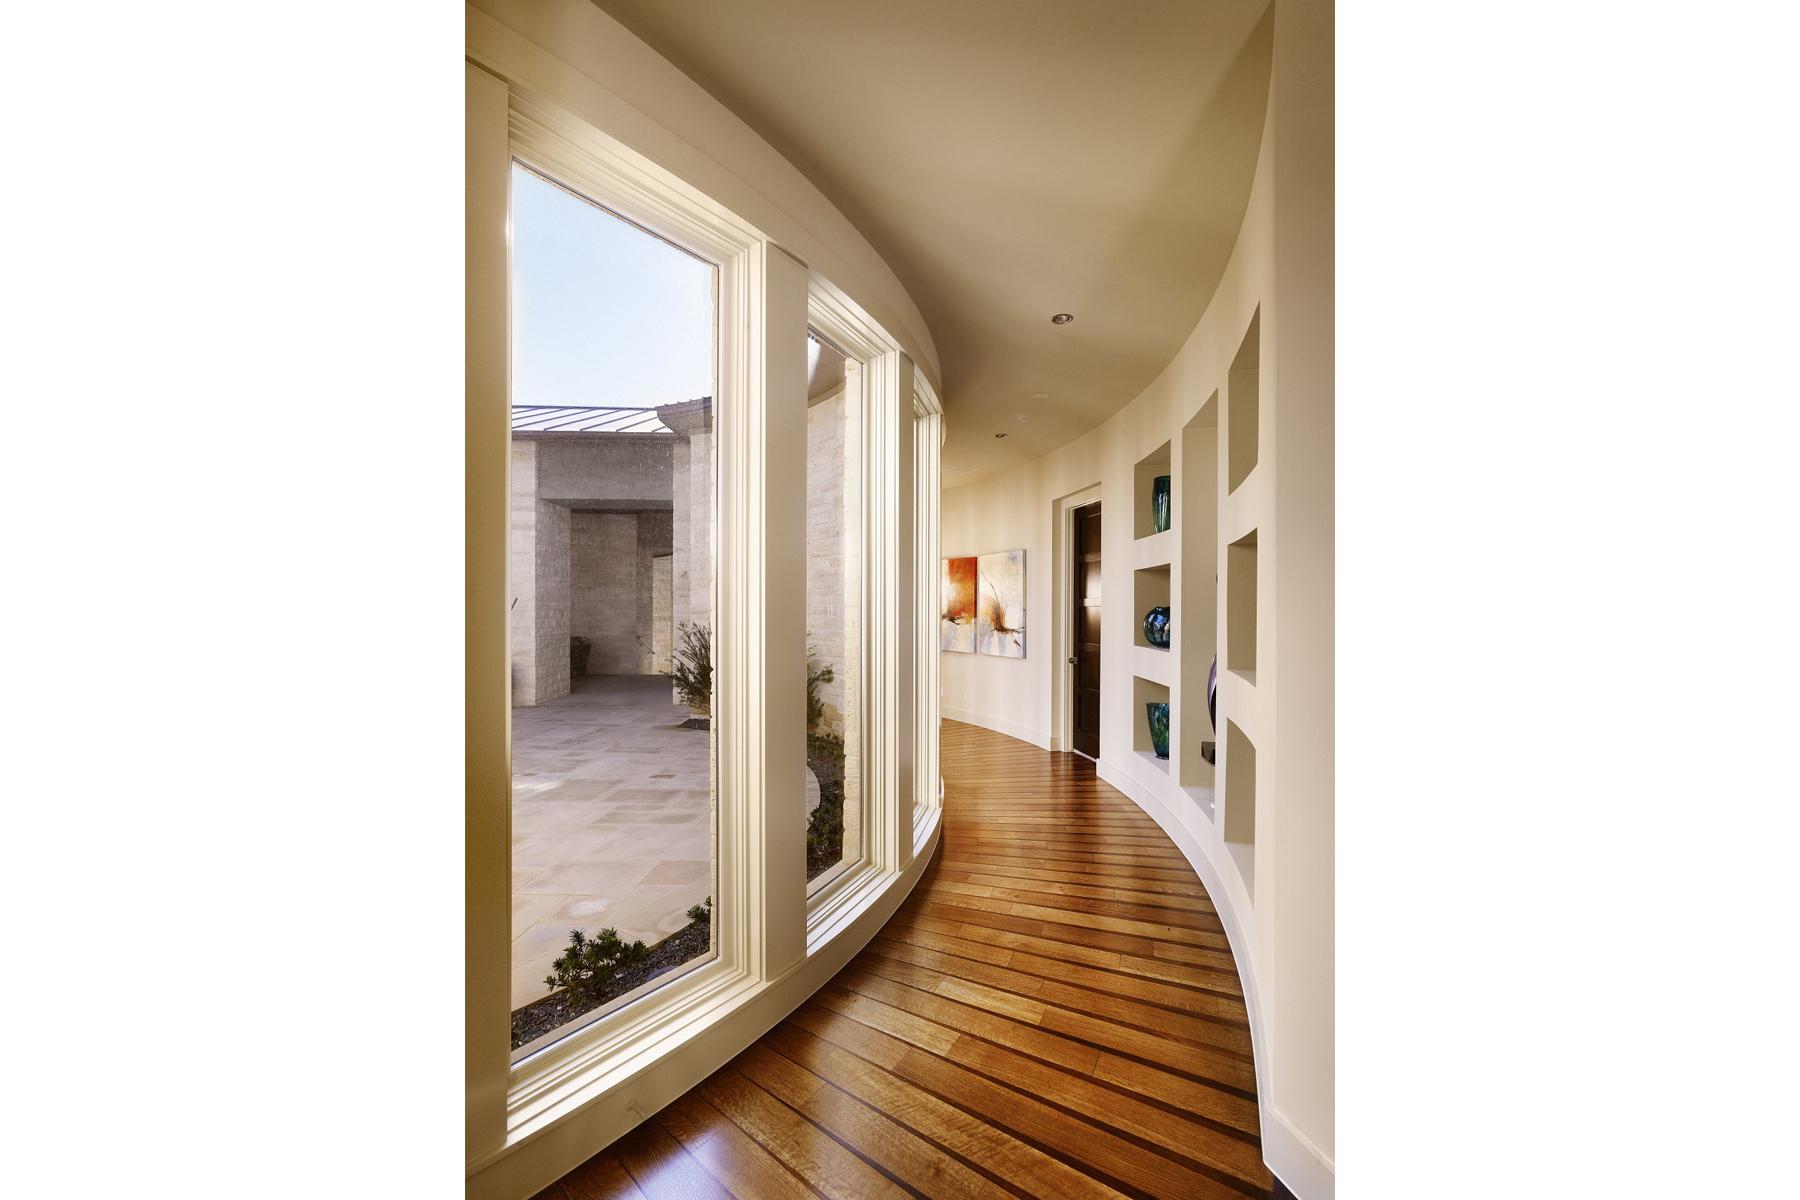 spanish-oaks-curved-hallway